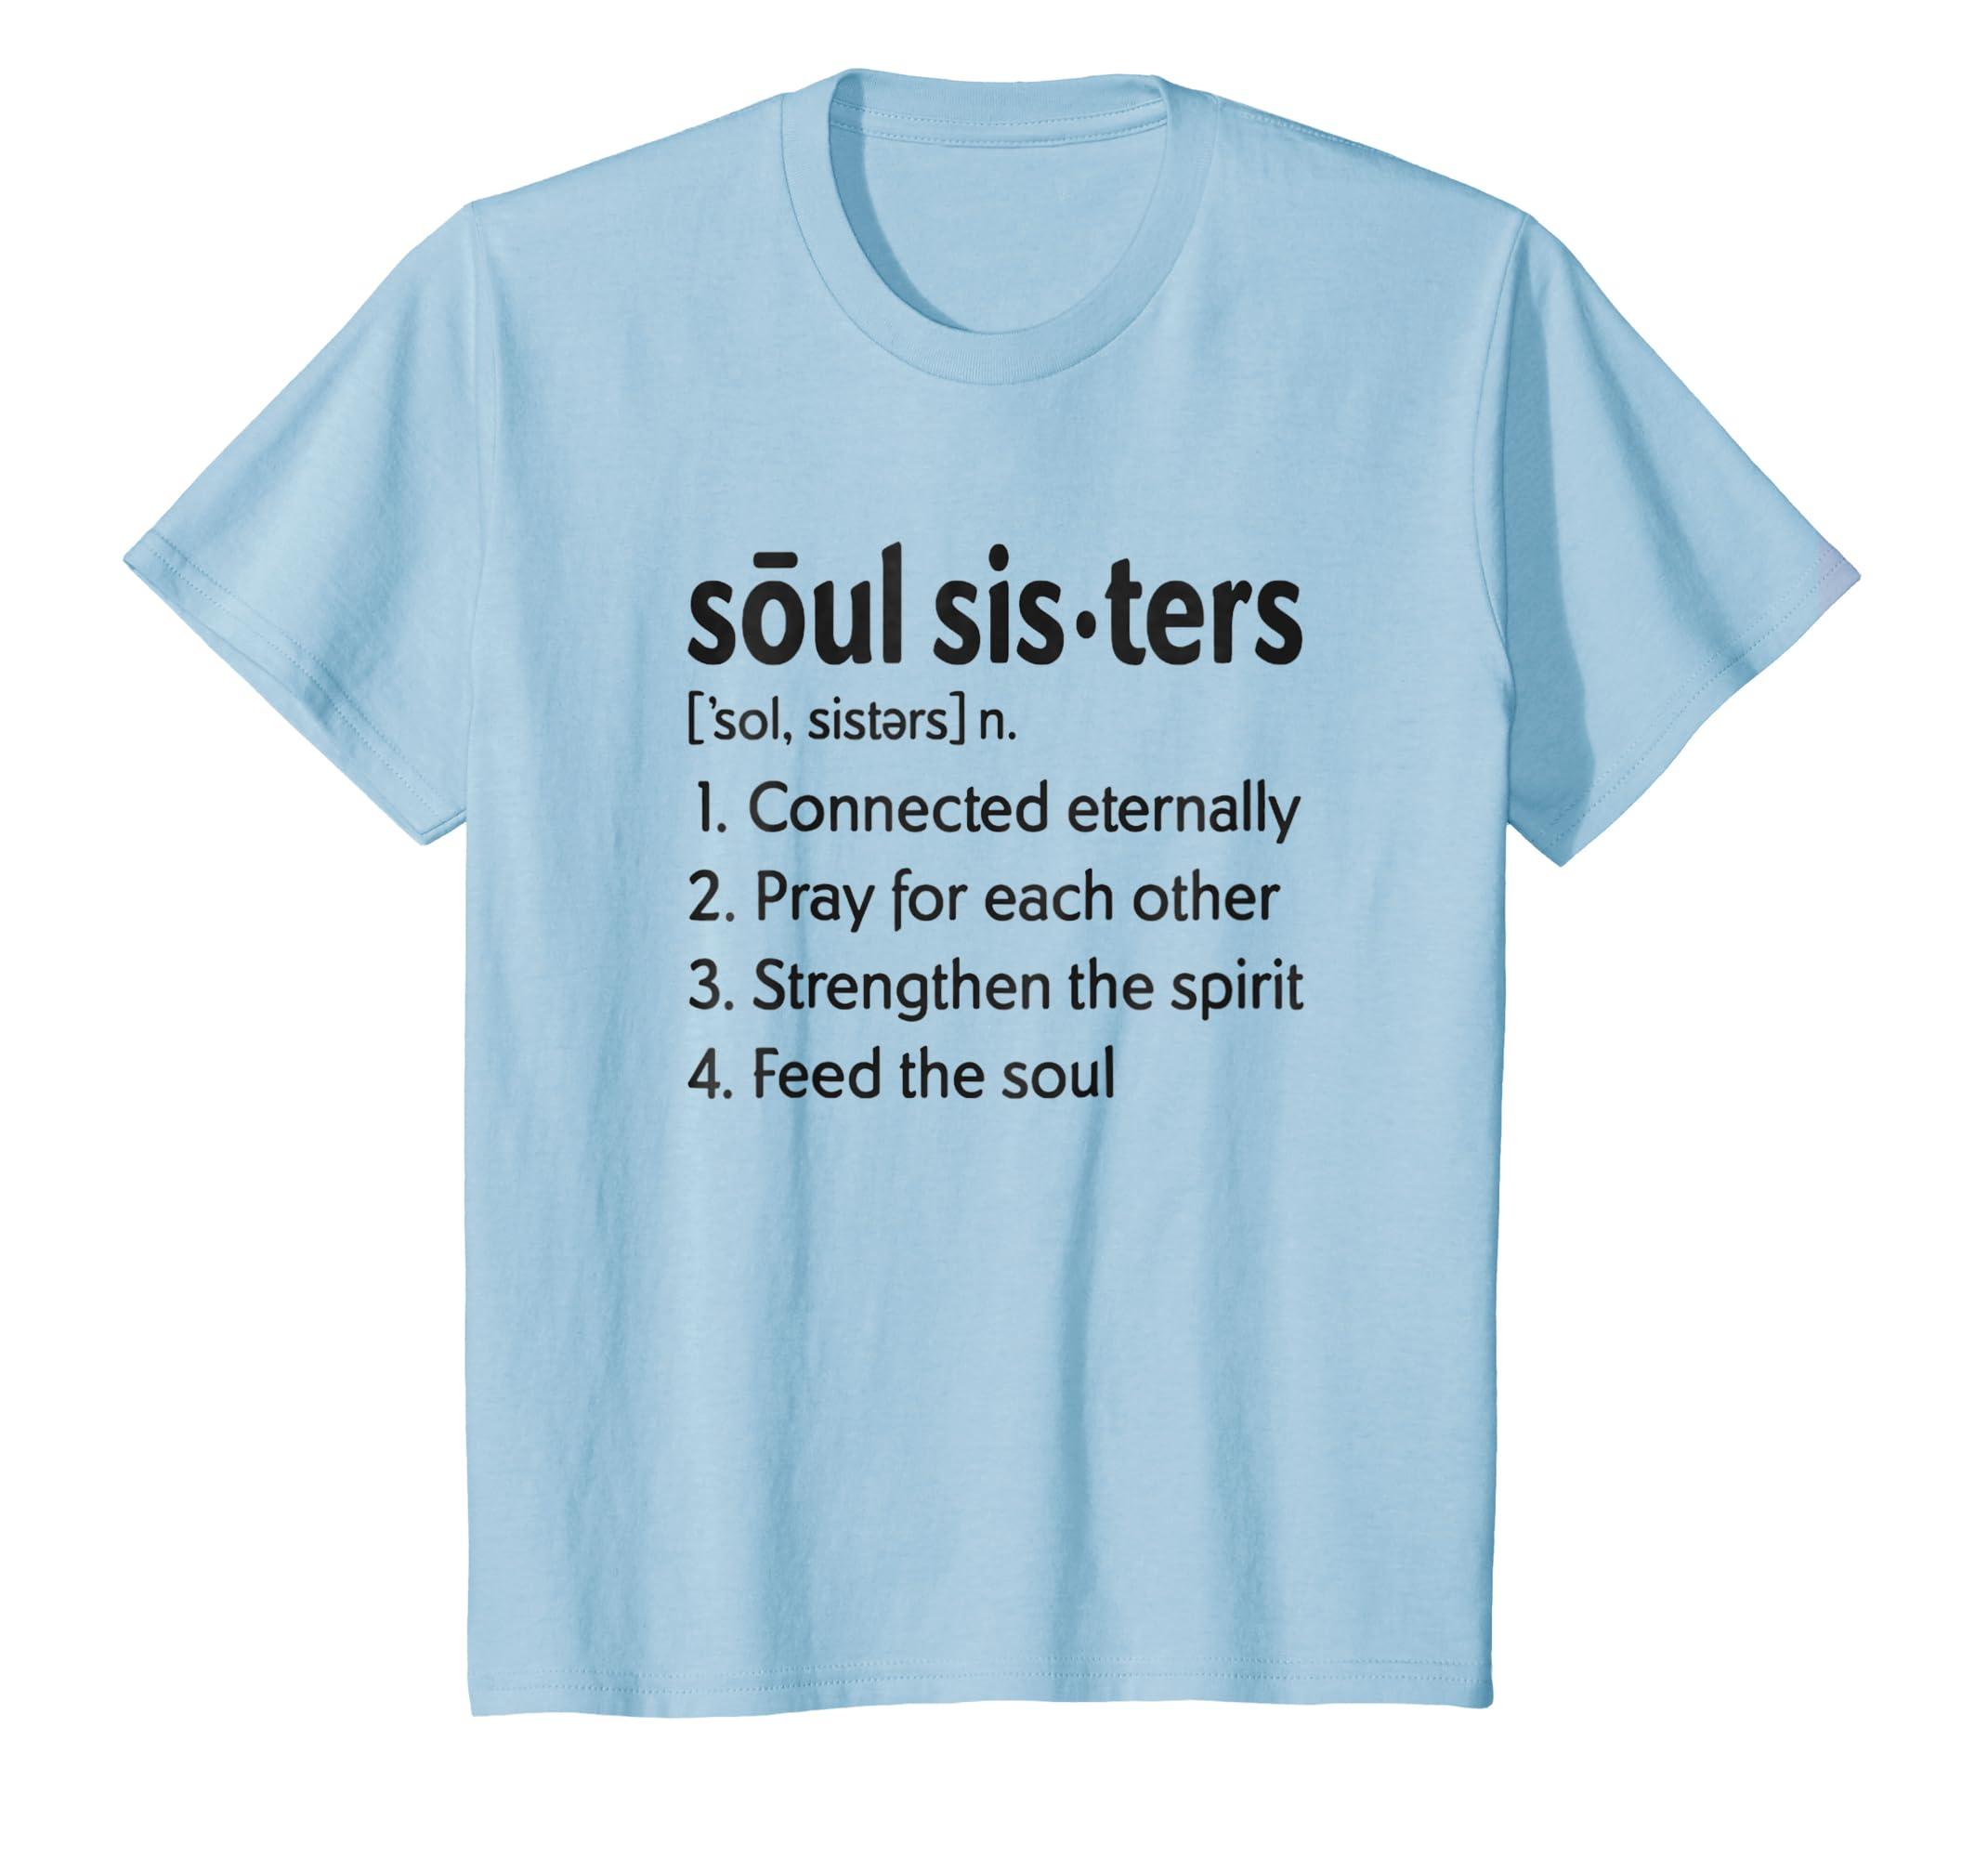 Amazon.com: SOUL SISTERS Definition T-shirt For Women Men Girl boys ...